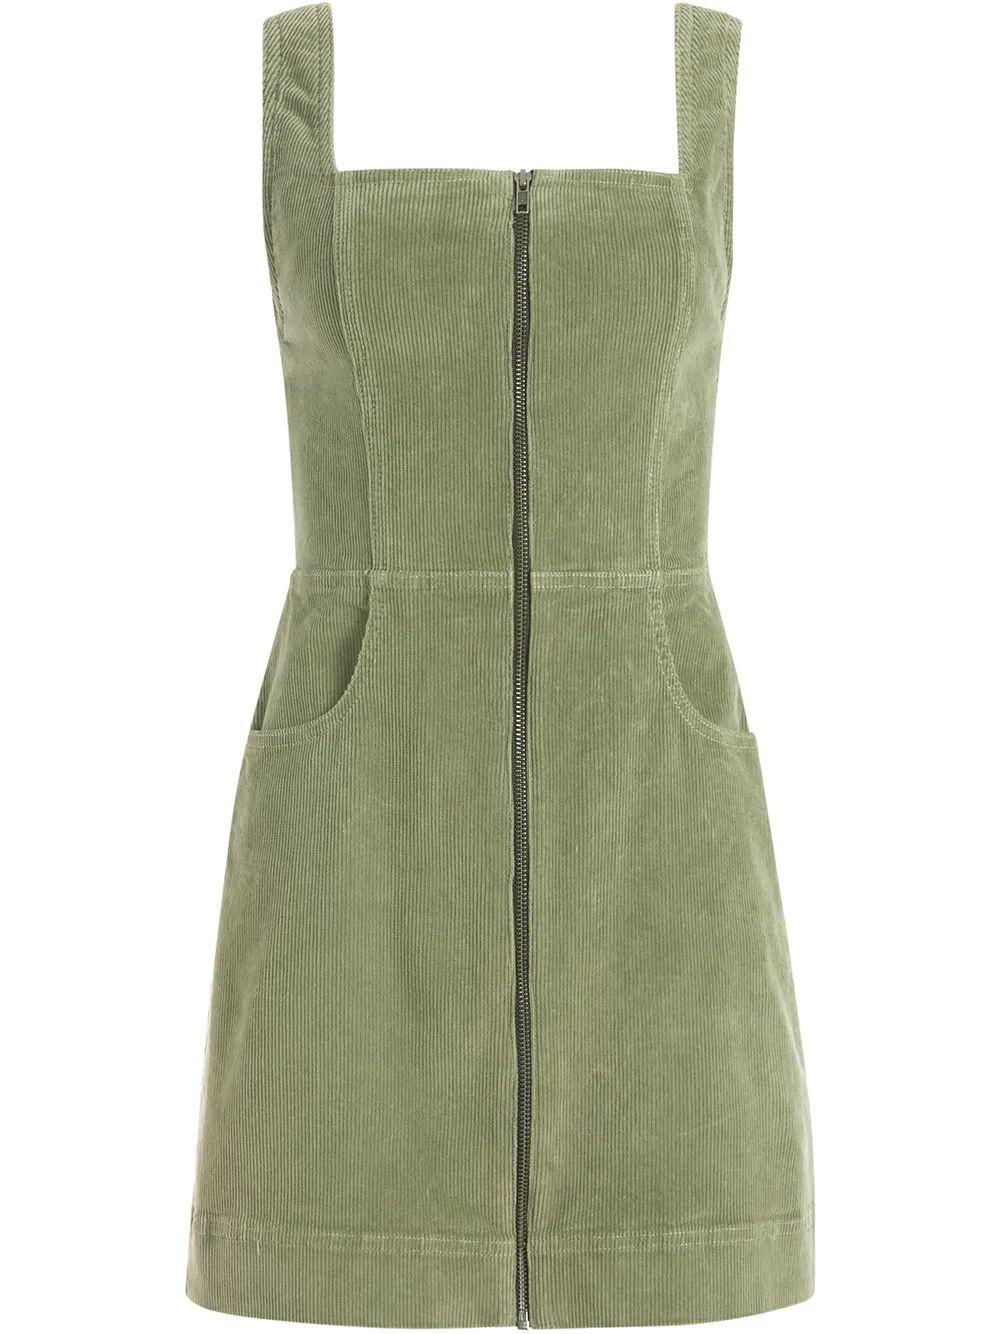 Renita Corduroy Mini Dress Item # CD624307DYR